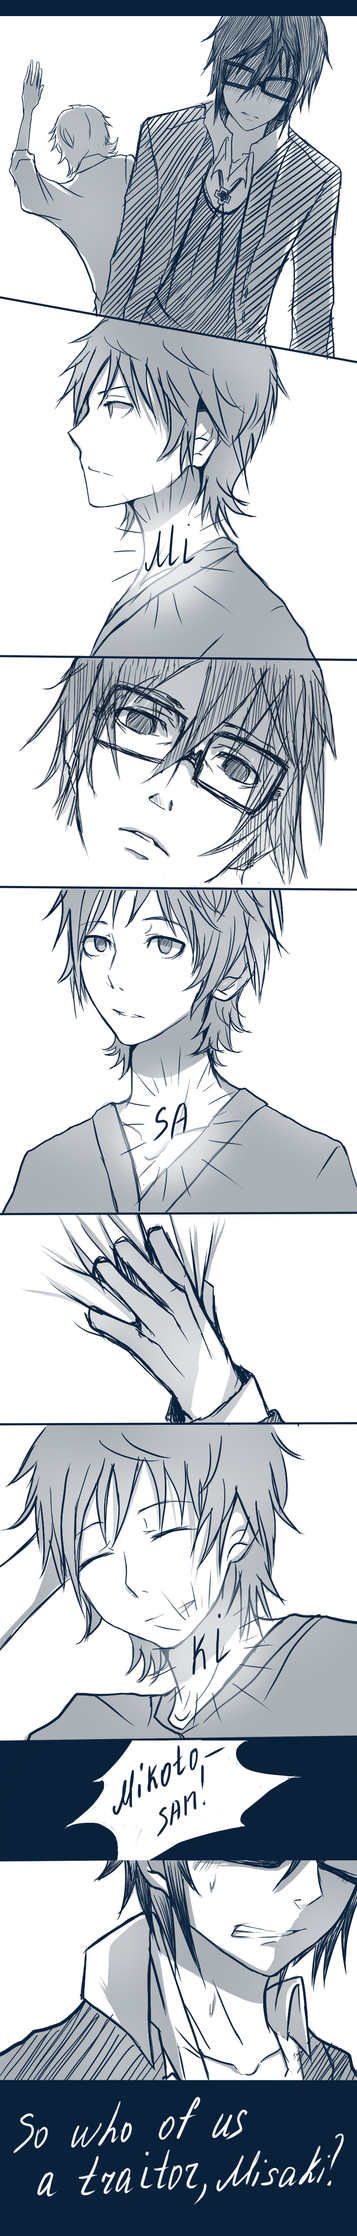 SaruMi (3 of 3) by Dessa-nya